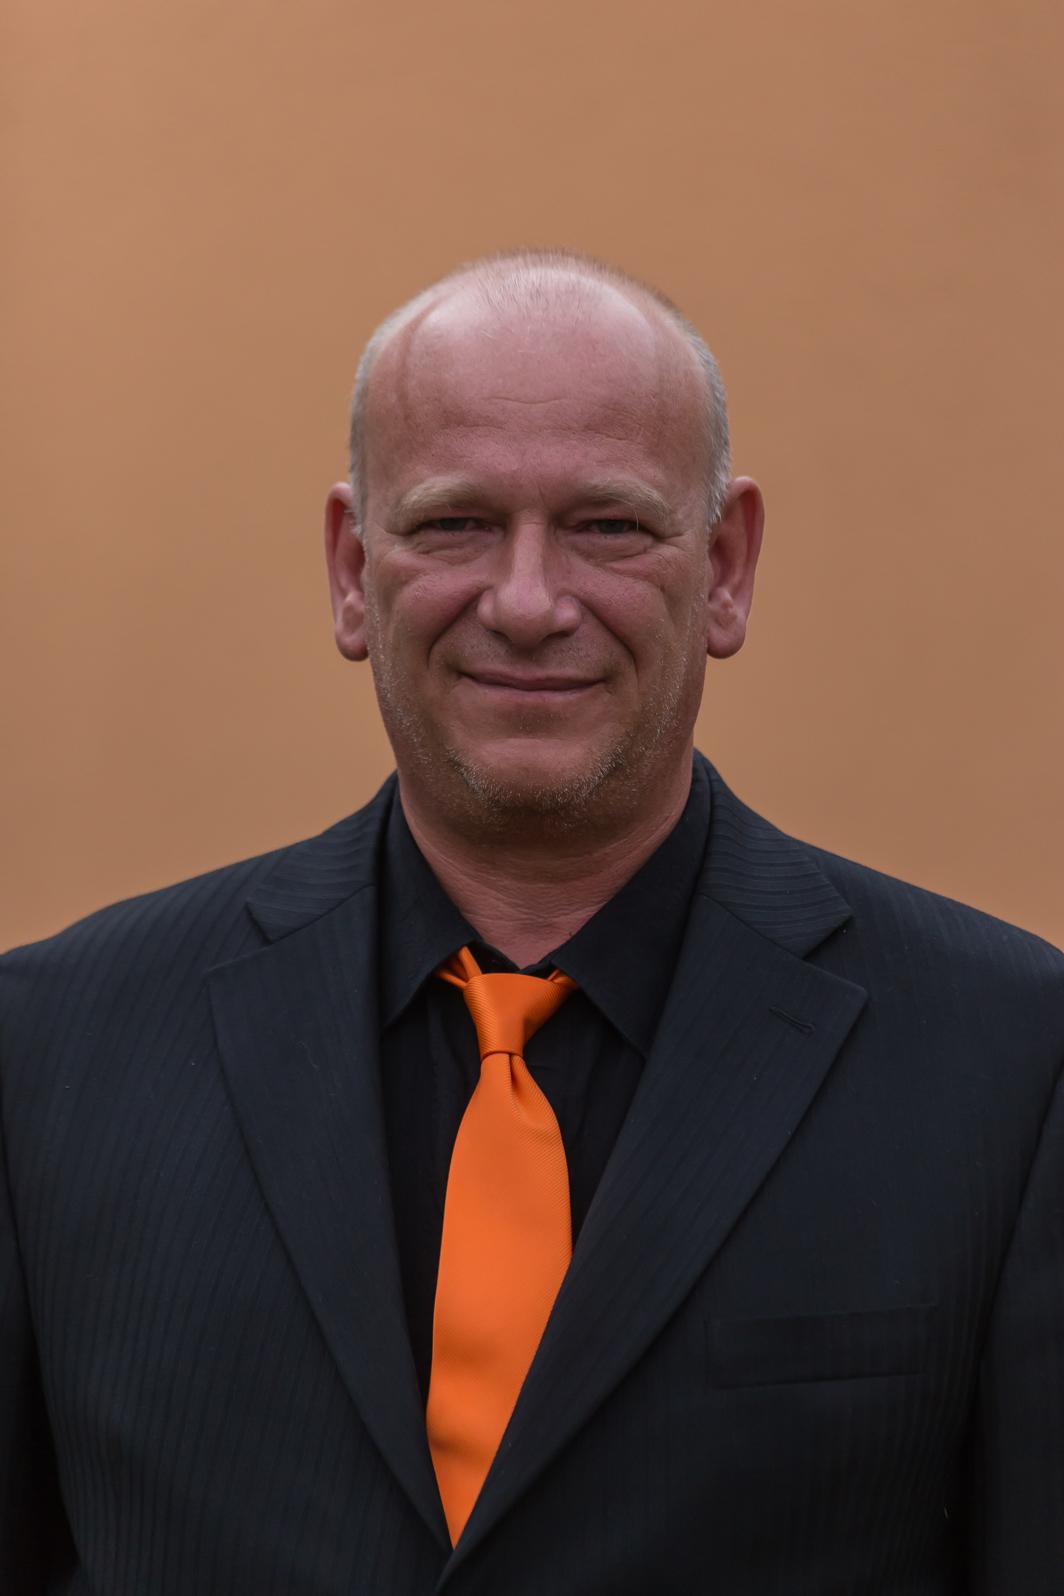 Jens-Uwe Scharke